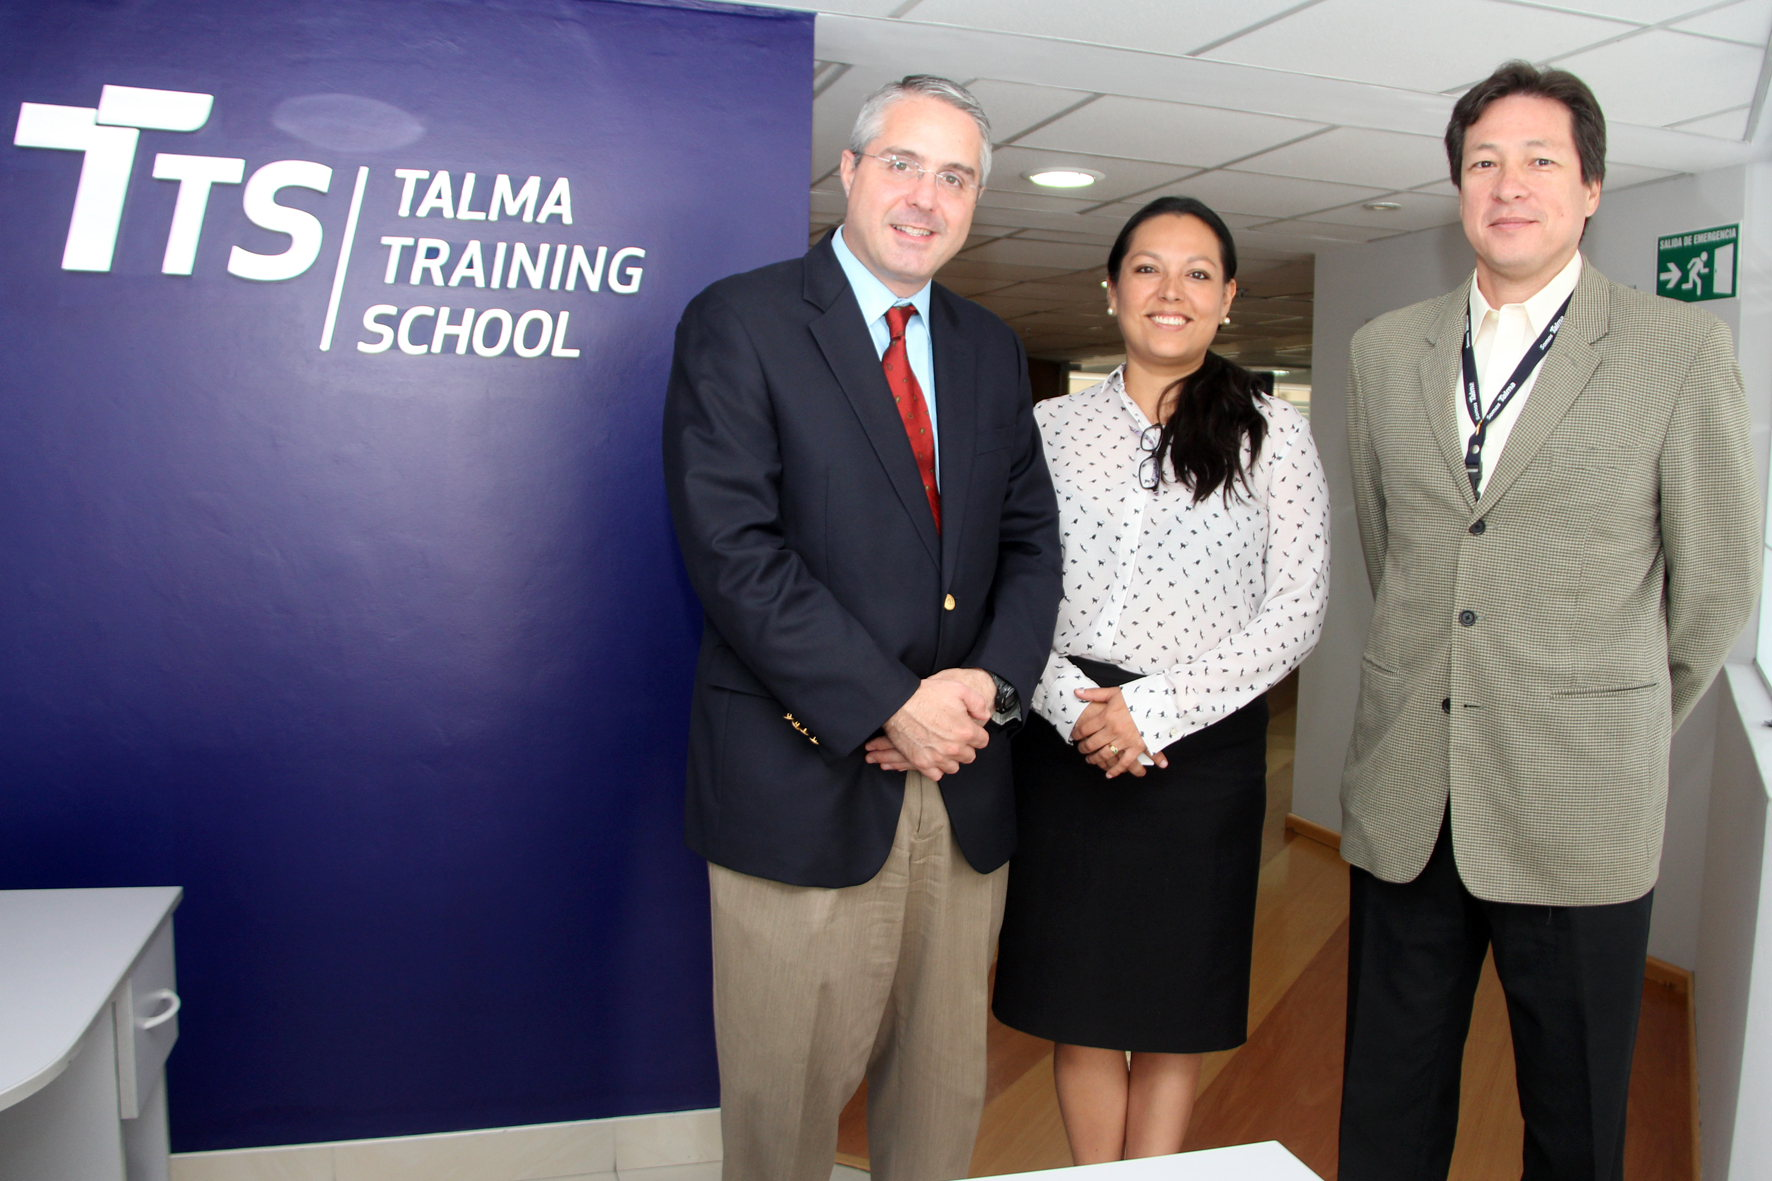 TALMA Training School e IATA inician serie de programas de capacitación para integrantes de la industria aérea